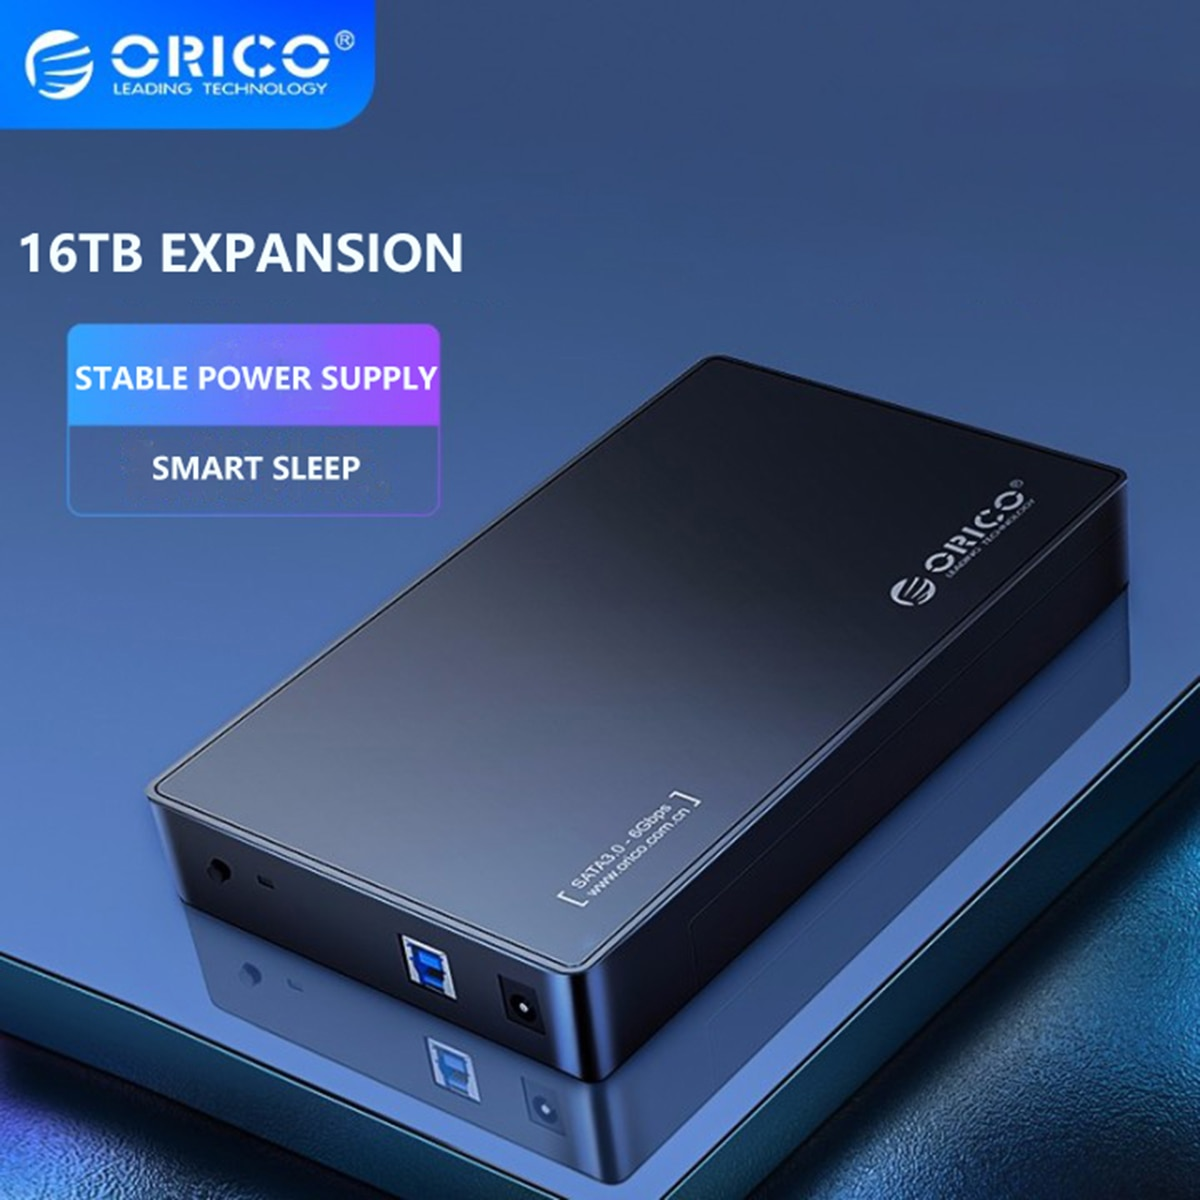 ORICO 3.5 بوصة HDD حافظة قرص صلب خارجي ضميمة SATA إلى USB 3.0 5Gbps HDD صندوق ل 2.5 3.5 SSD أسود حافظة أقراص-free